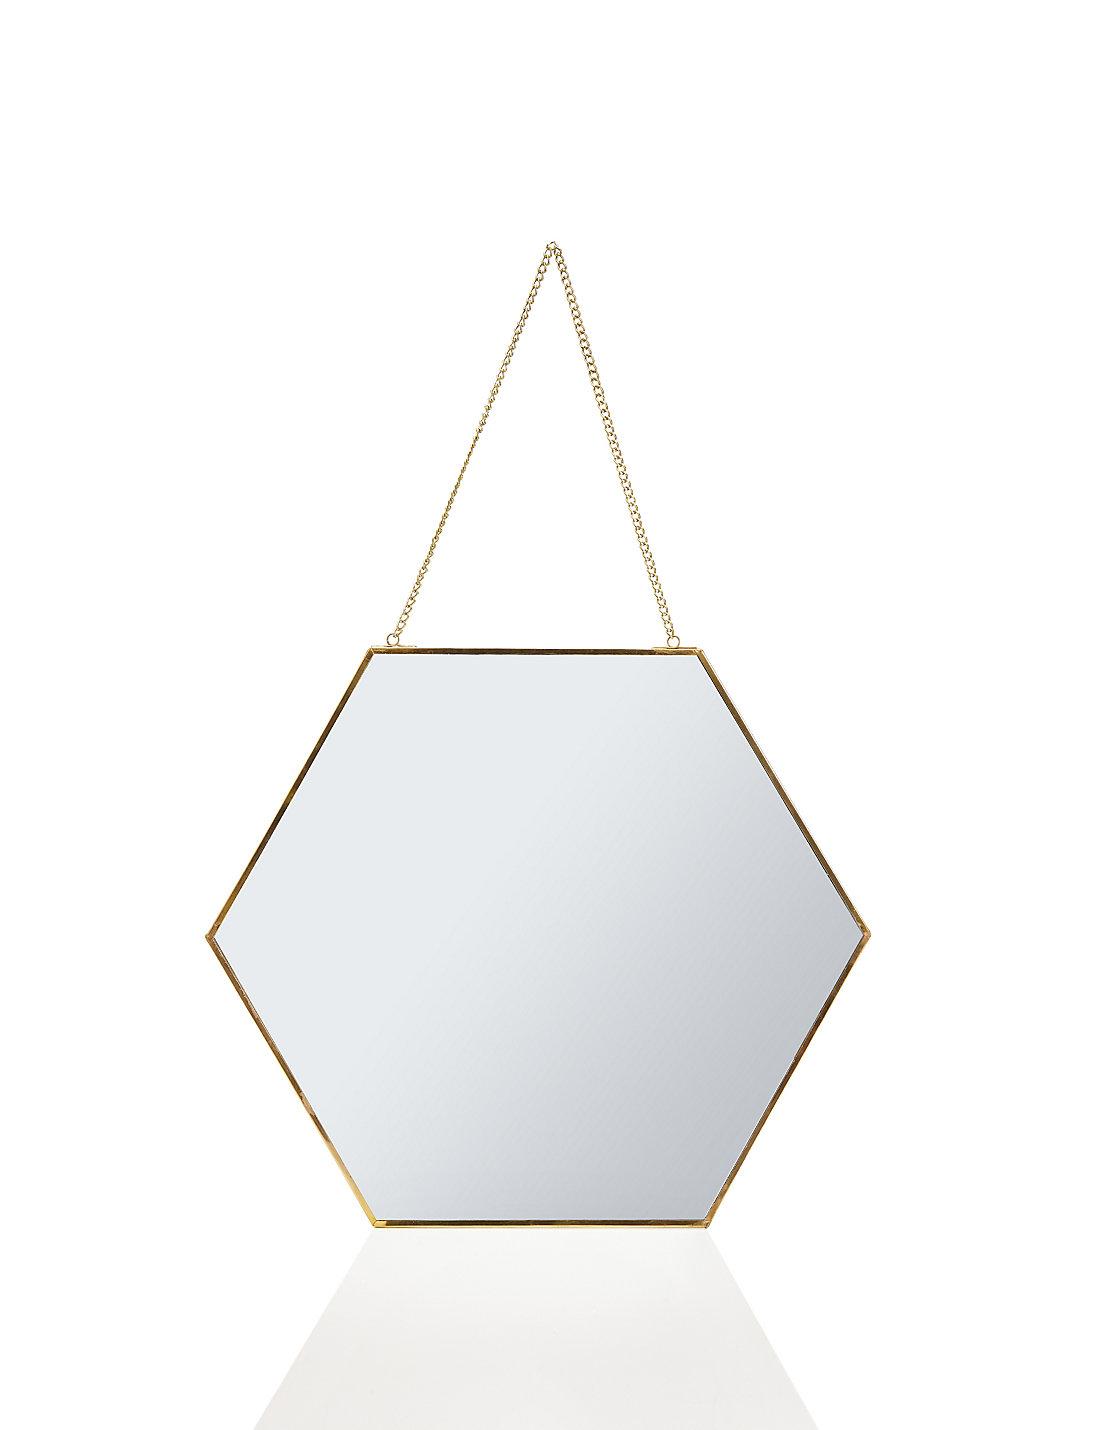 Hexagonal Mirror Frame